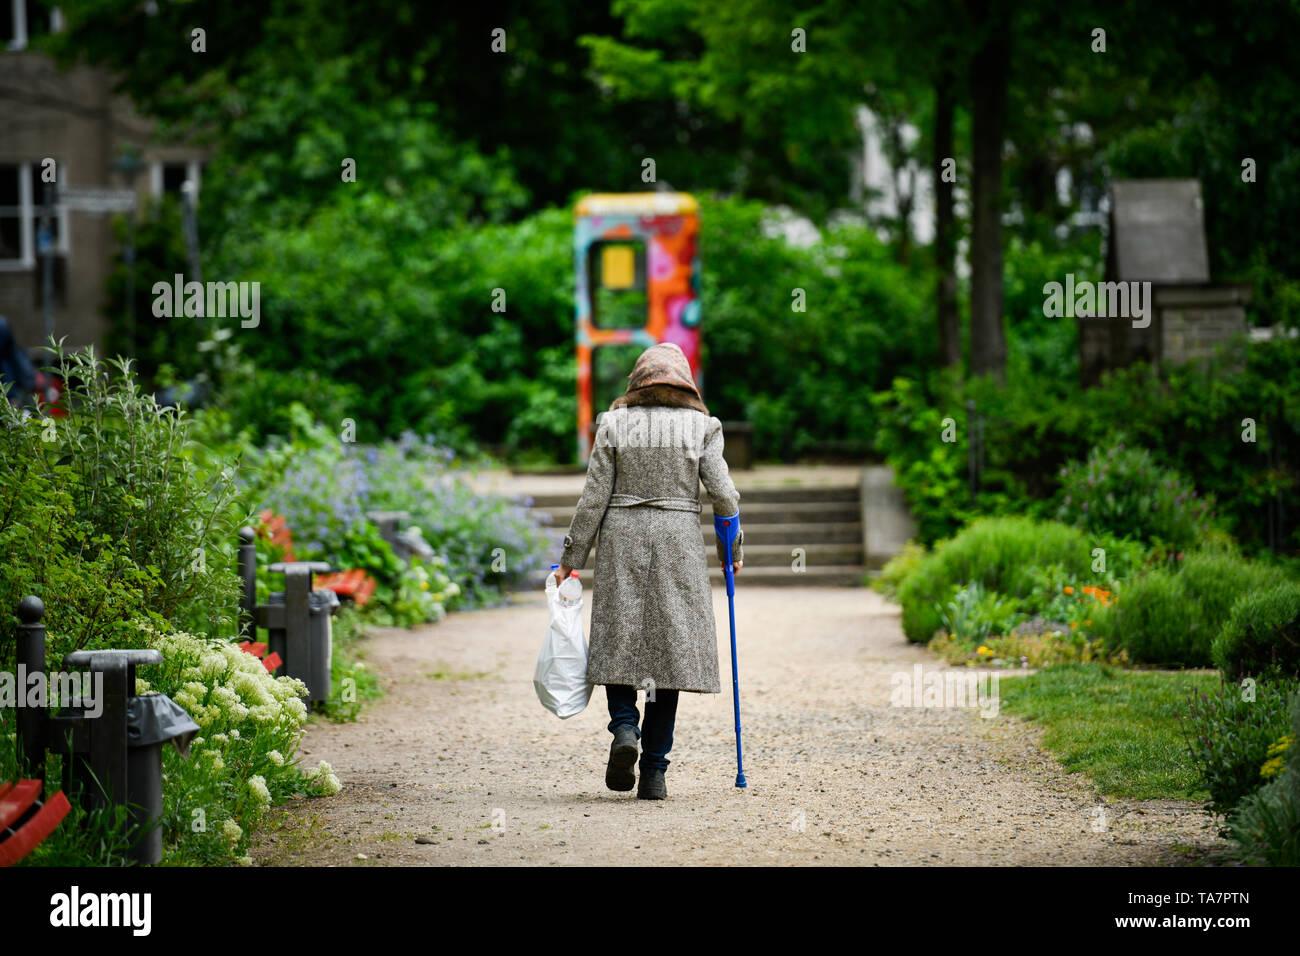 Put symbolic photo, old-age poverty, senior, bottle collecting, park, Gestelltes Symbolfoto, Altersarmut, Seniorin, Flaschensammeln, Park - Stock Image